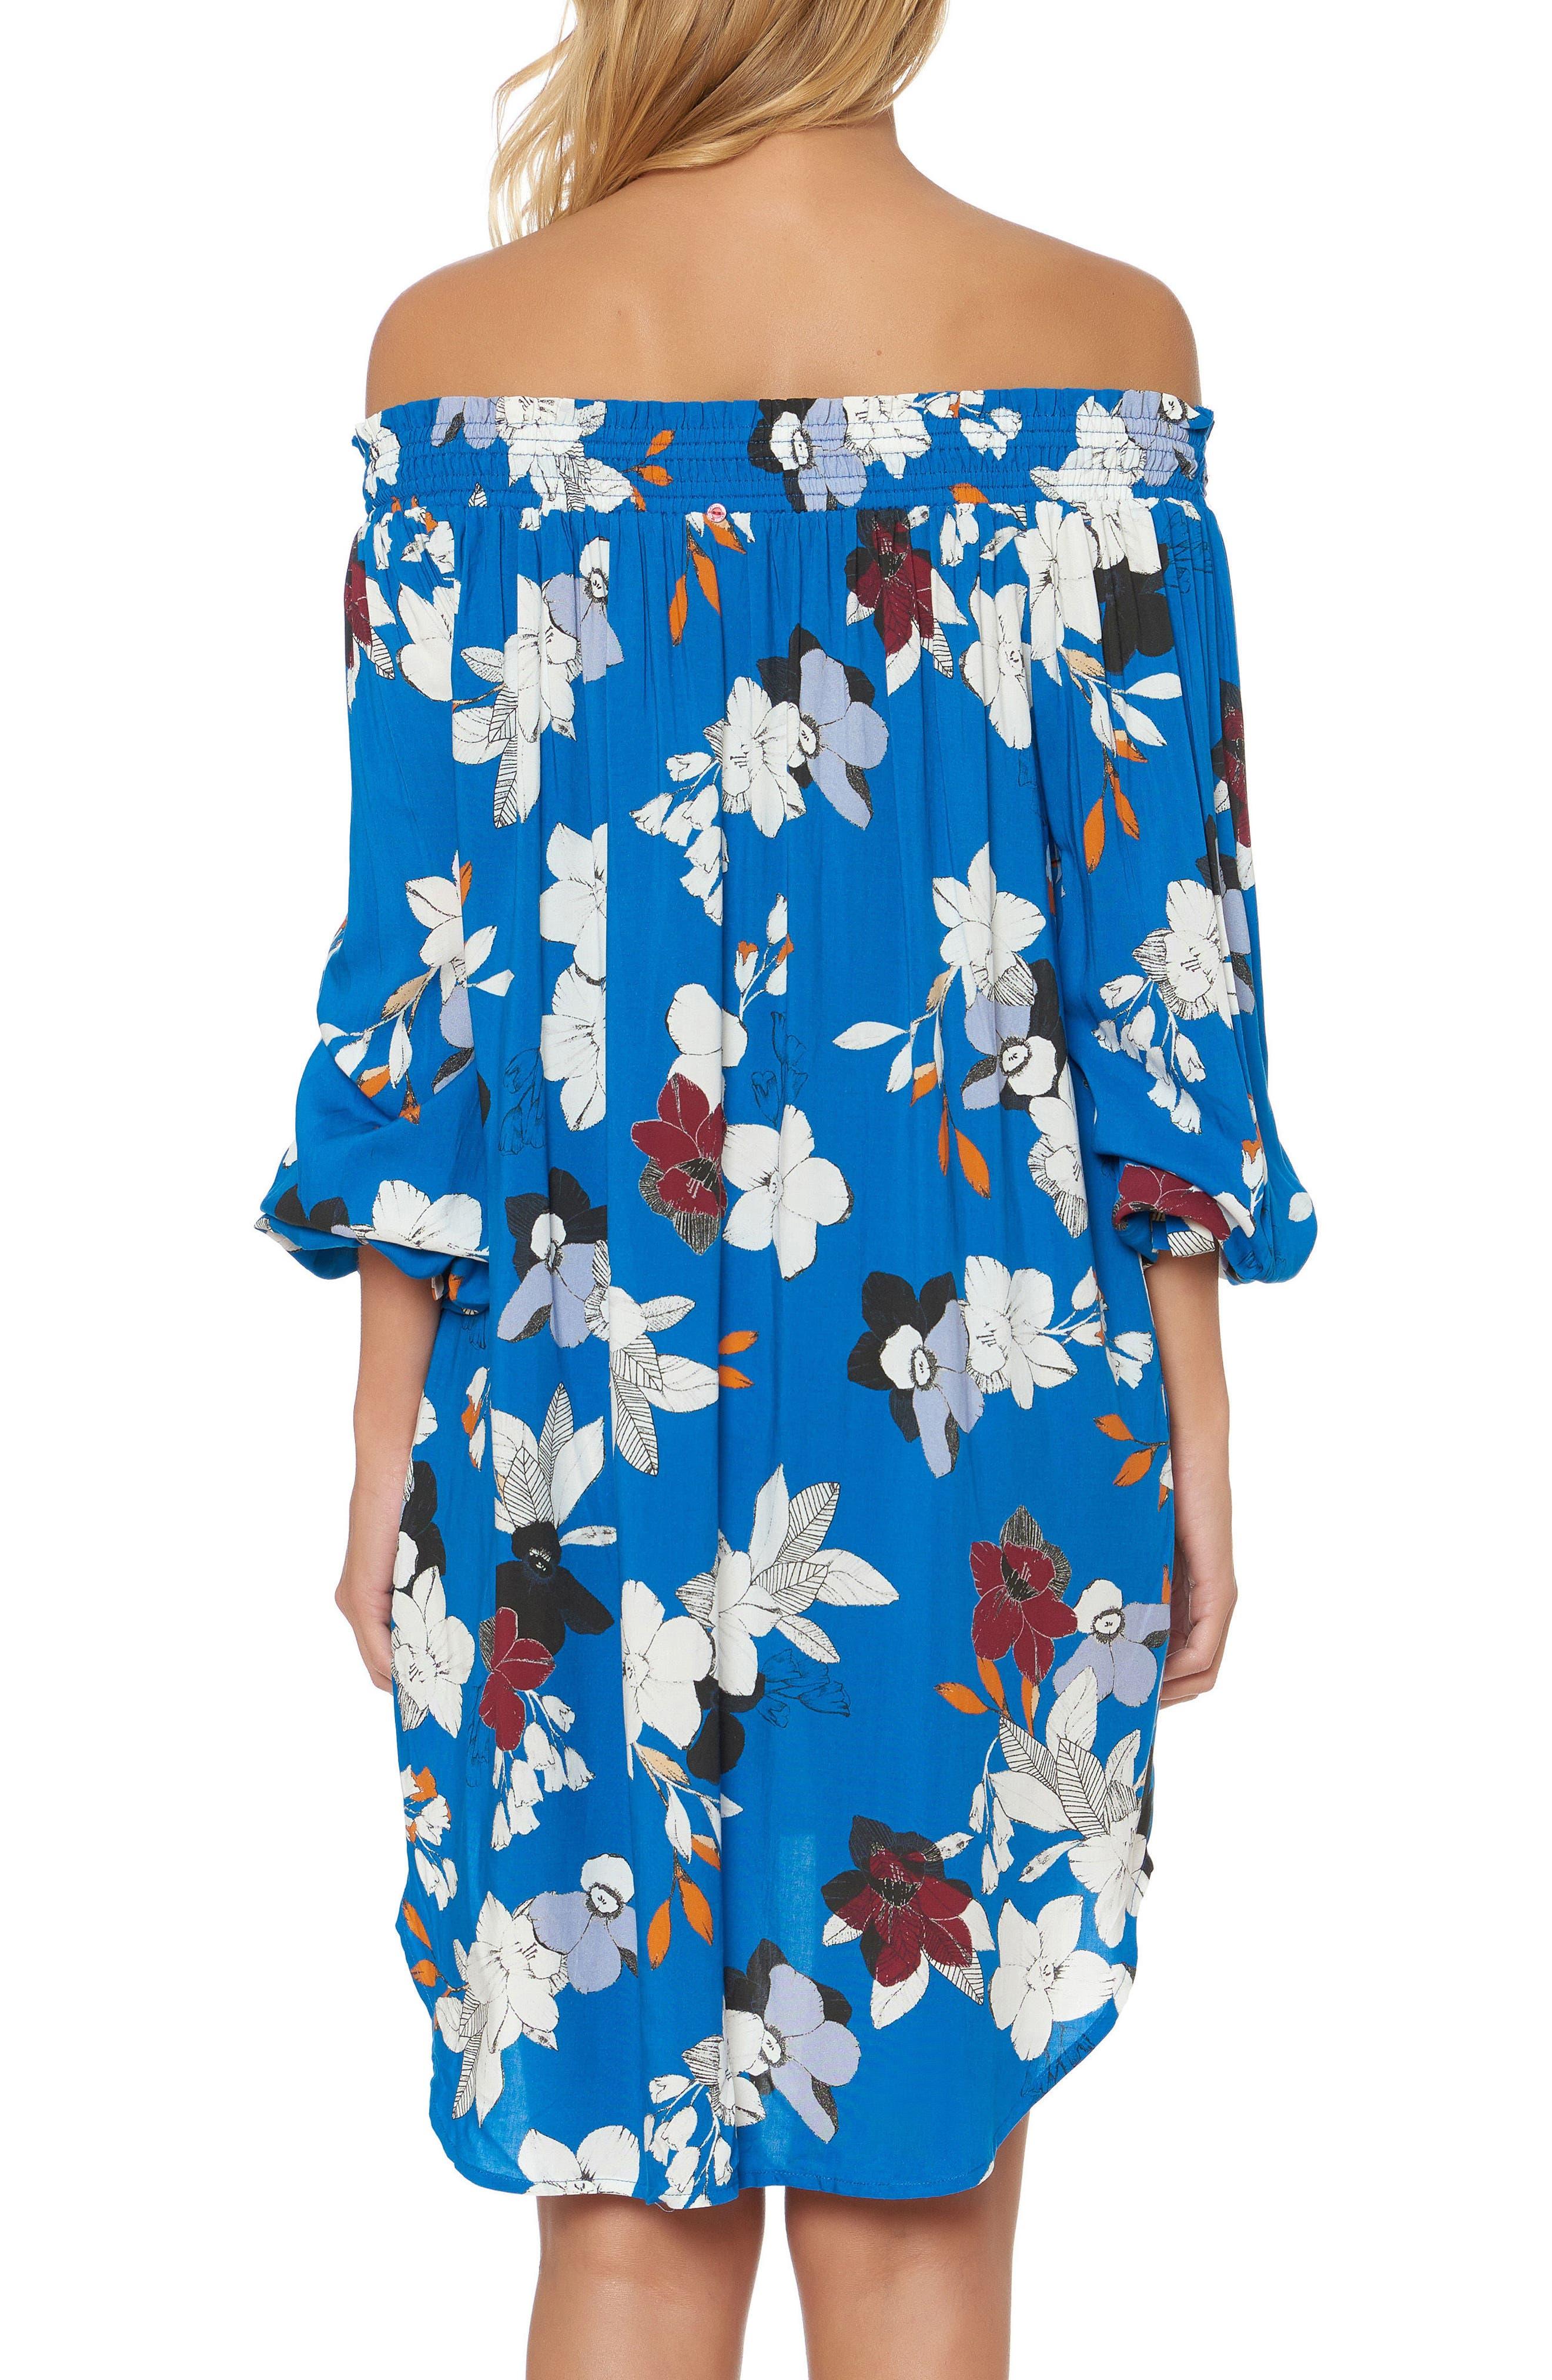 Floral Off the Shoulder Cover-Up Dress,                             Alternate thumbnail 2, color,                             VISION